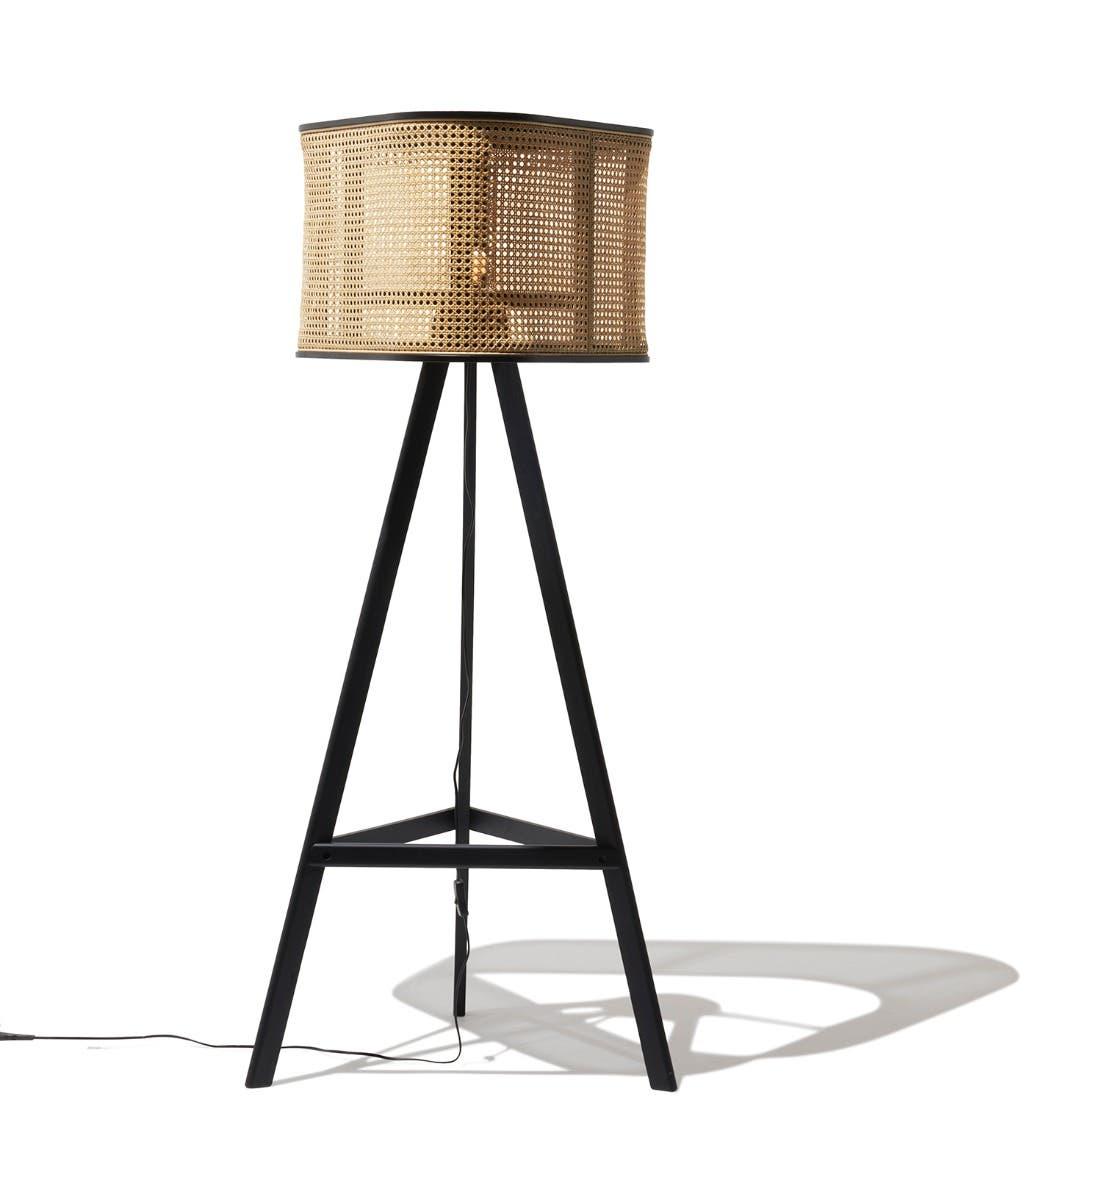 Industry West Cane Floor Lamp Green